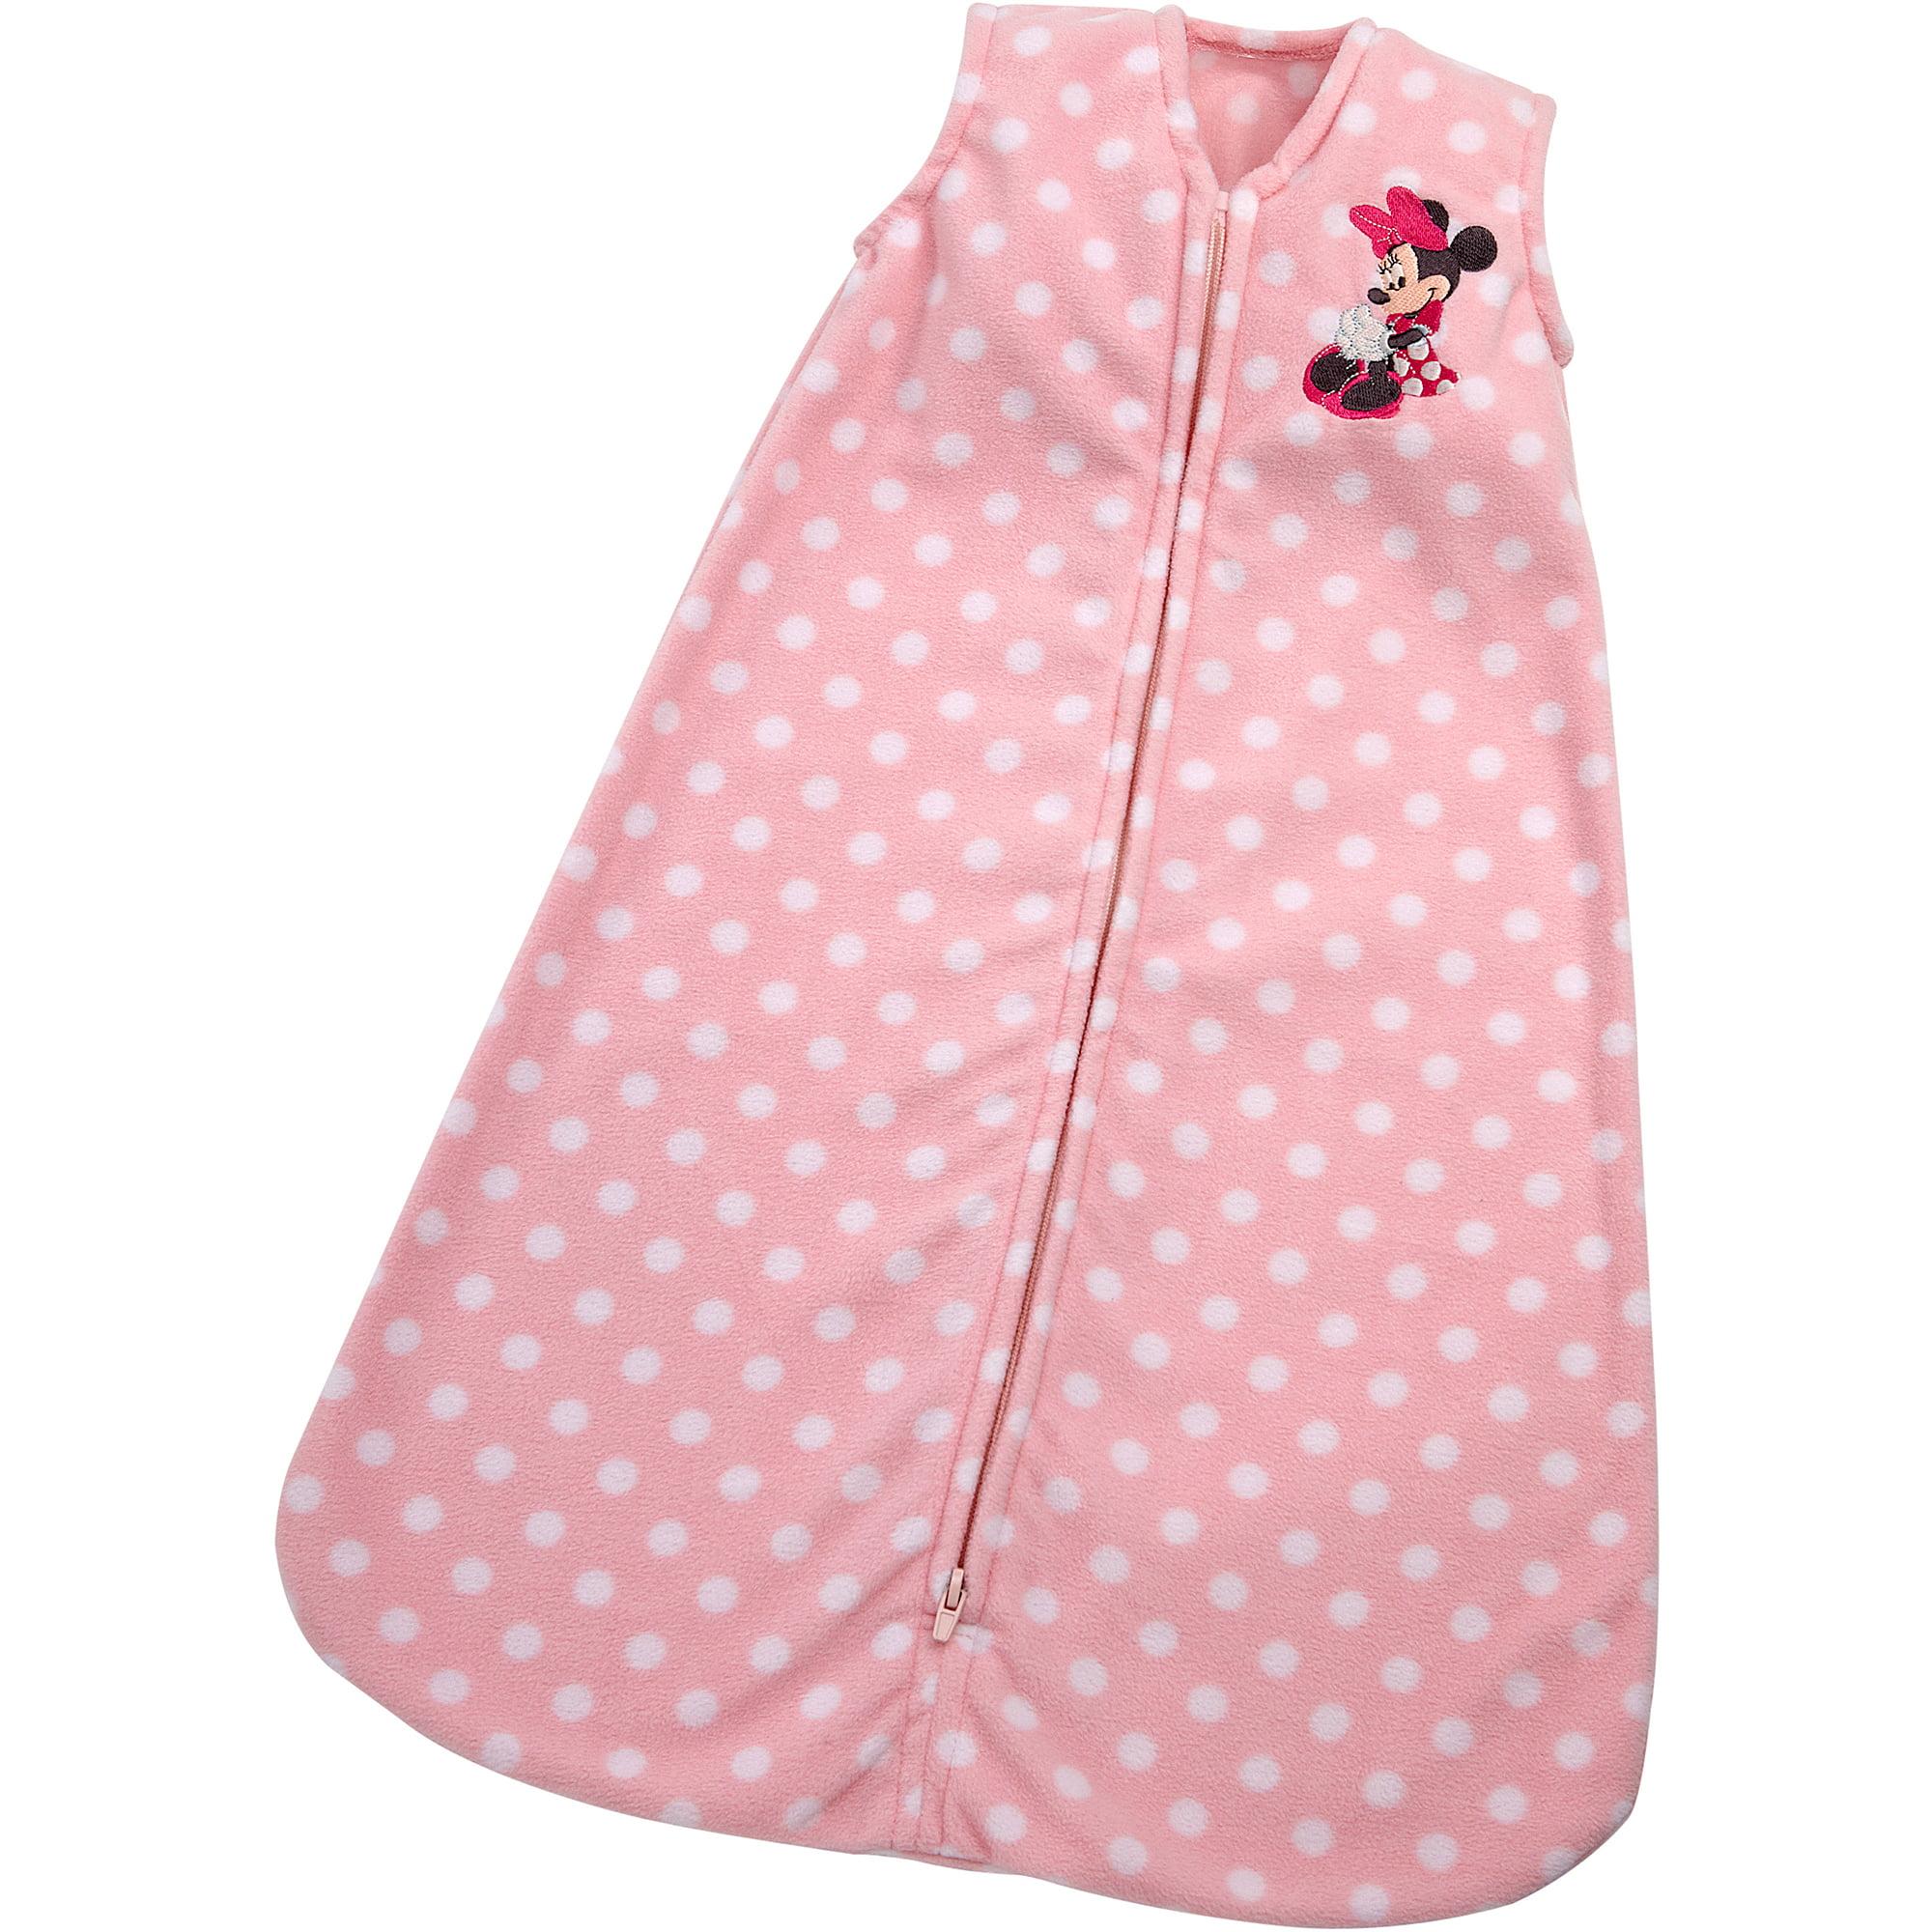 Medium Disney Baby Ariel Super Soft Microfleece Wearable Blanket Lavender